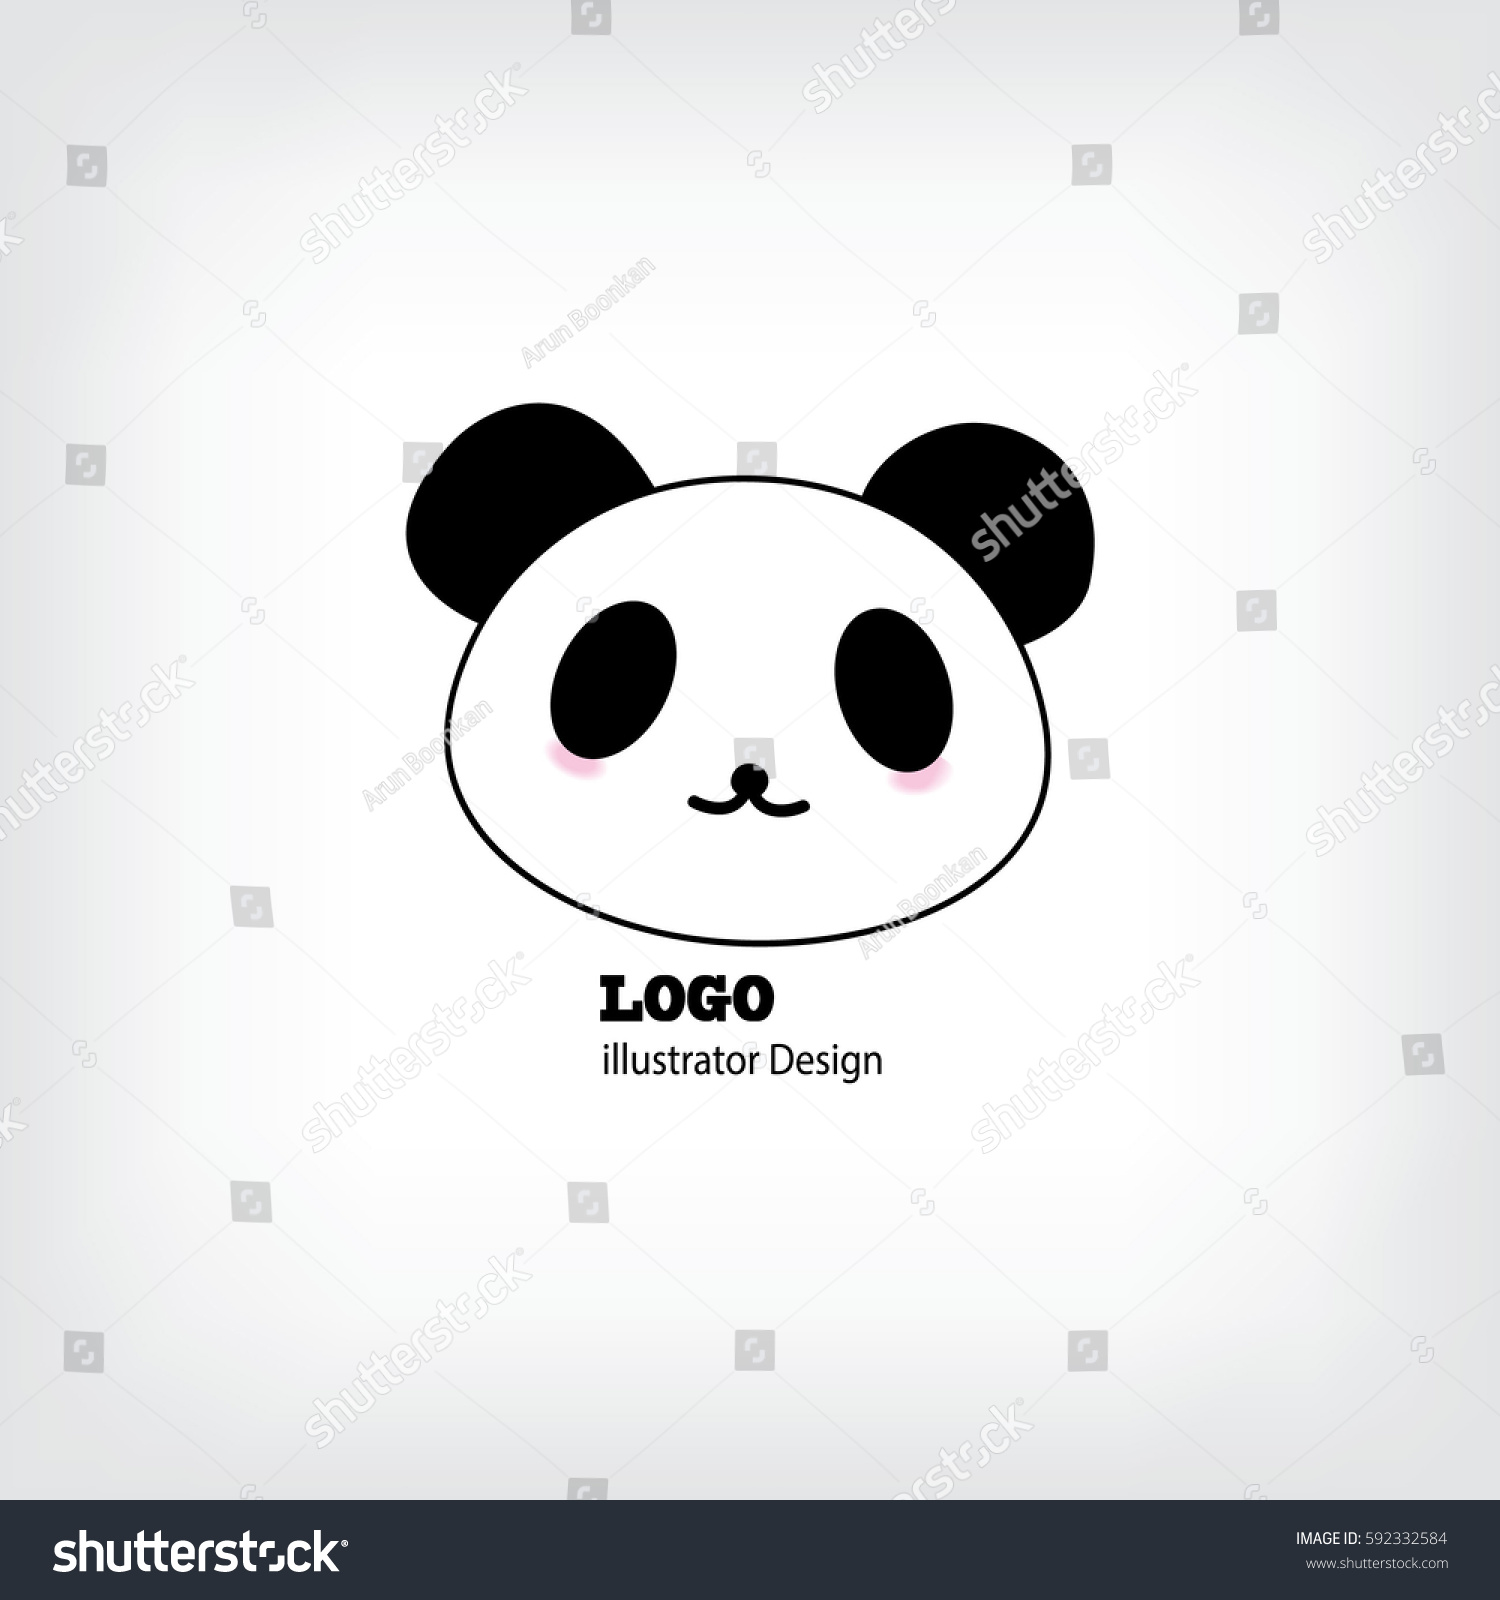 baby panda face logo template flat のベクター画像素材 ロイヤリティ